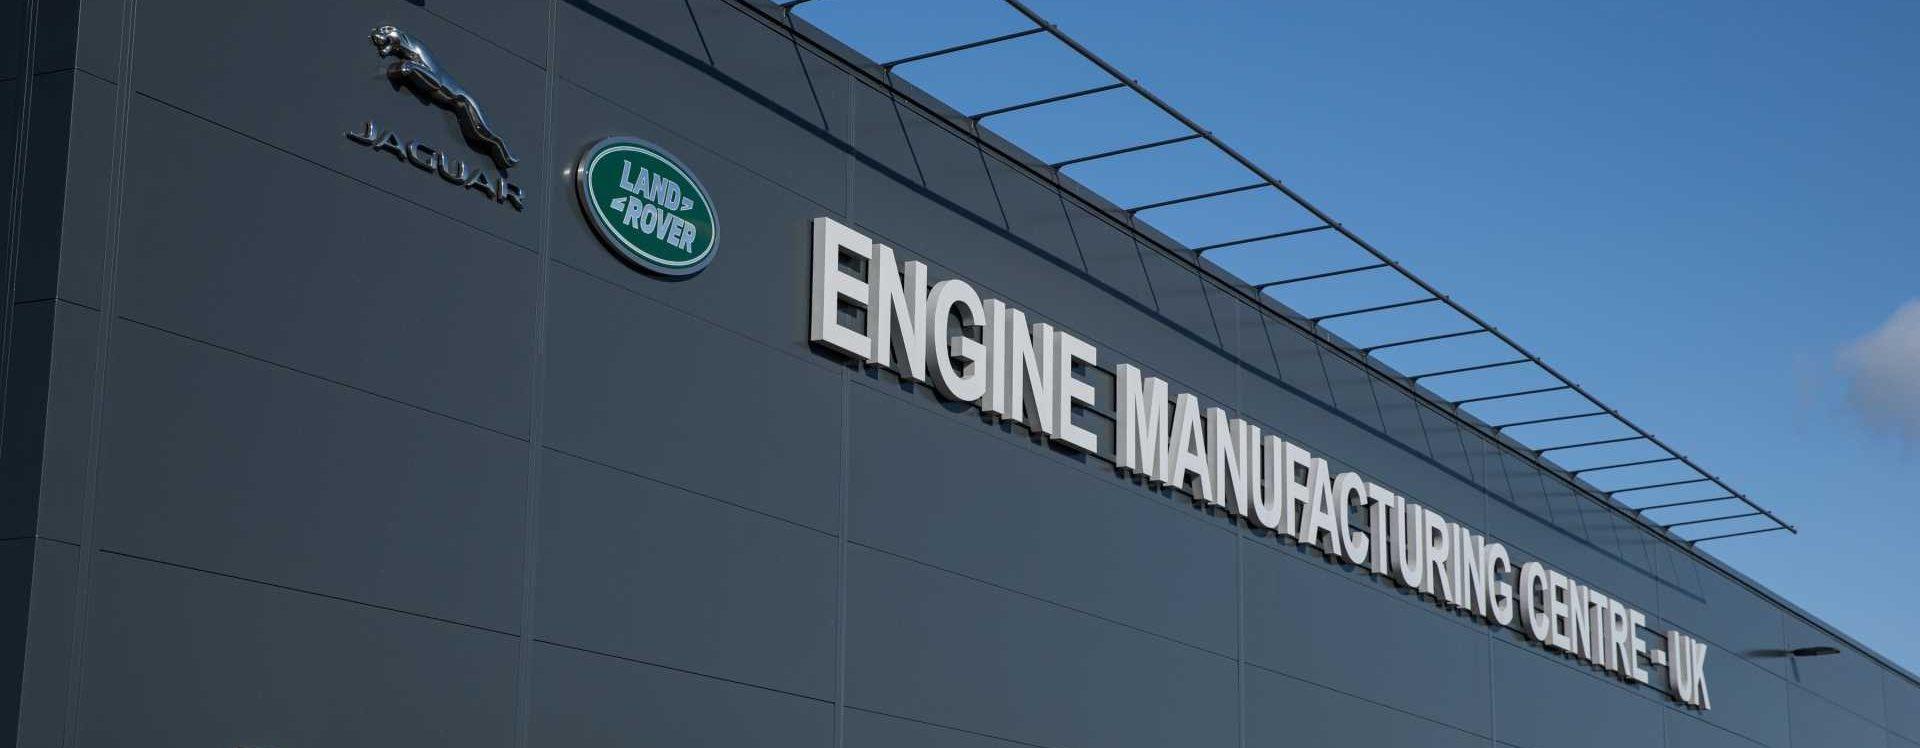 Jaguar Land Rover Engine Manufacturing Centre in Wolverhampton - Exterior